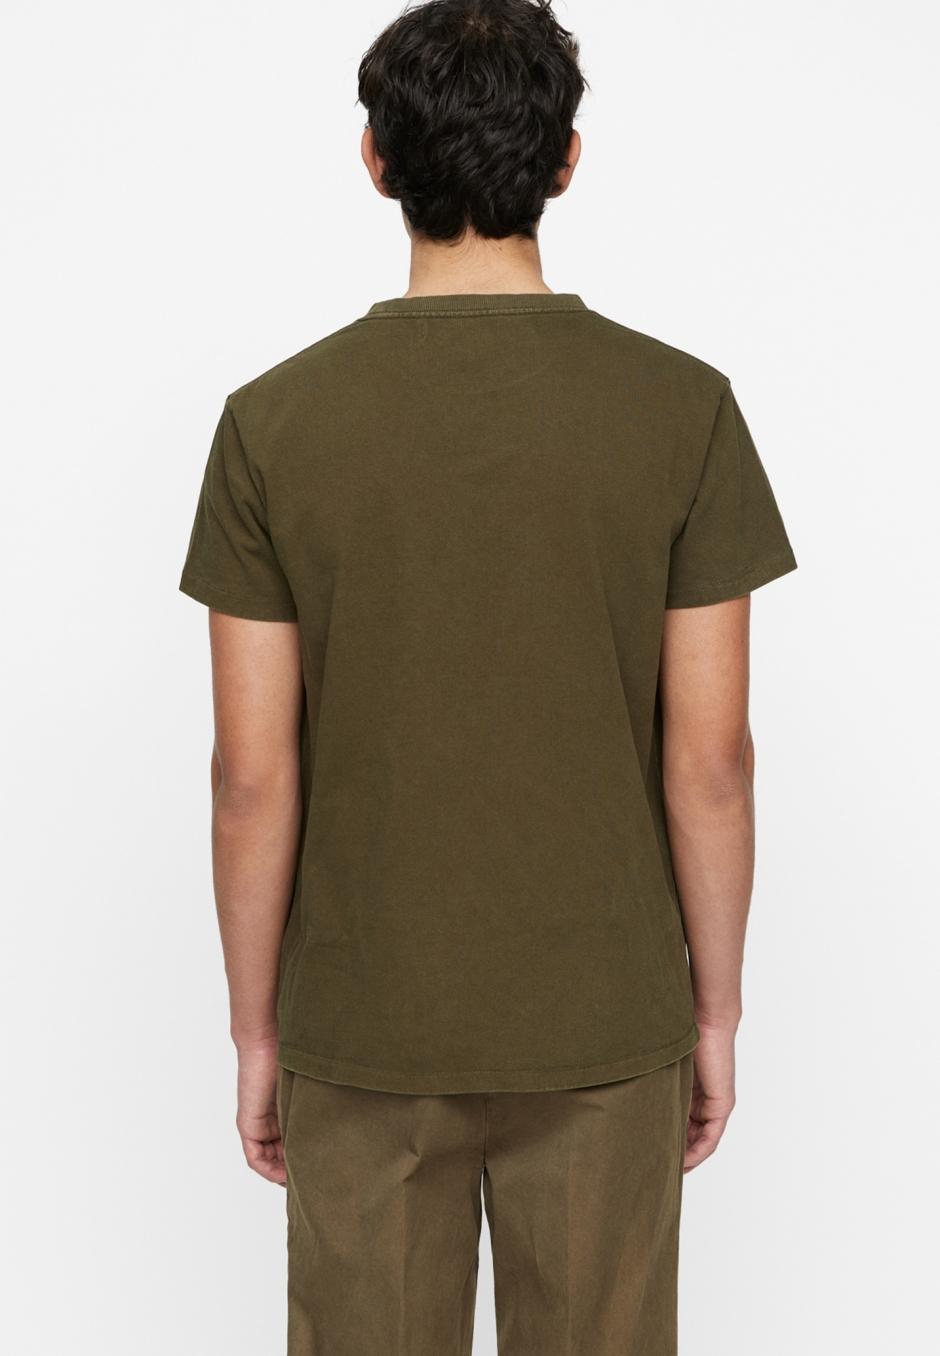 Schnayderman's T-Shirt Sch!